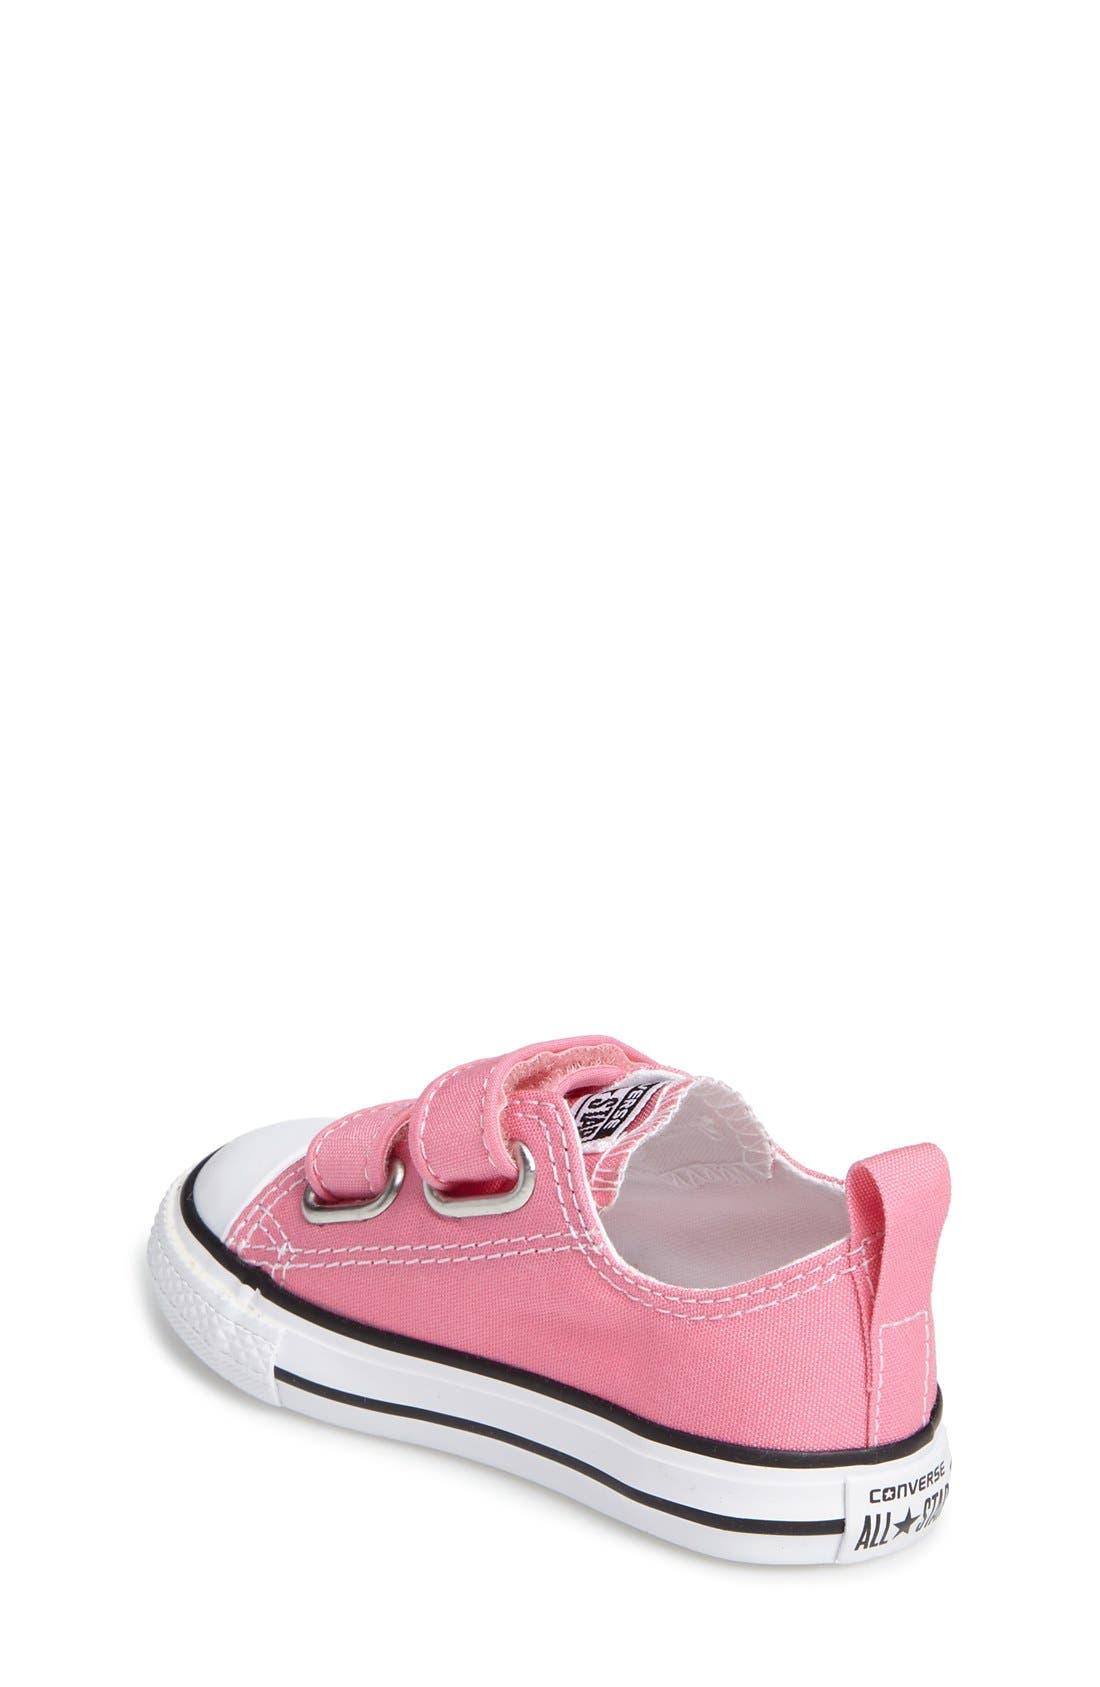 e1dd1d295614 Converse Baby Walking Shoes